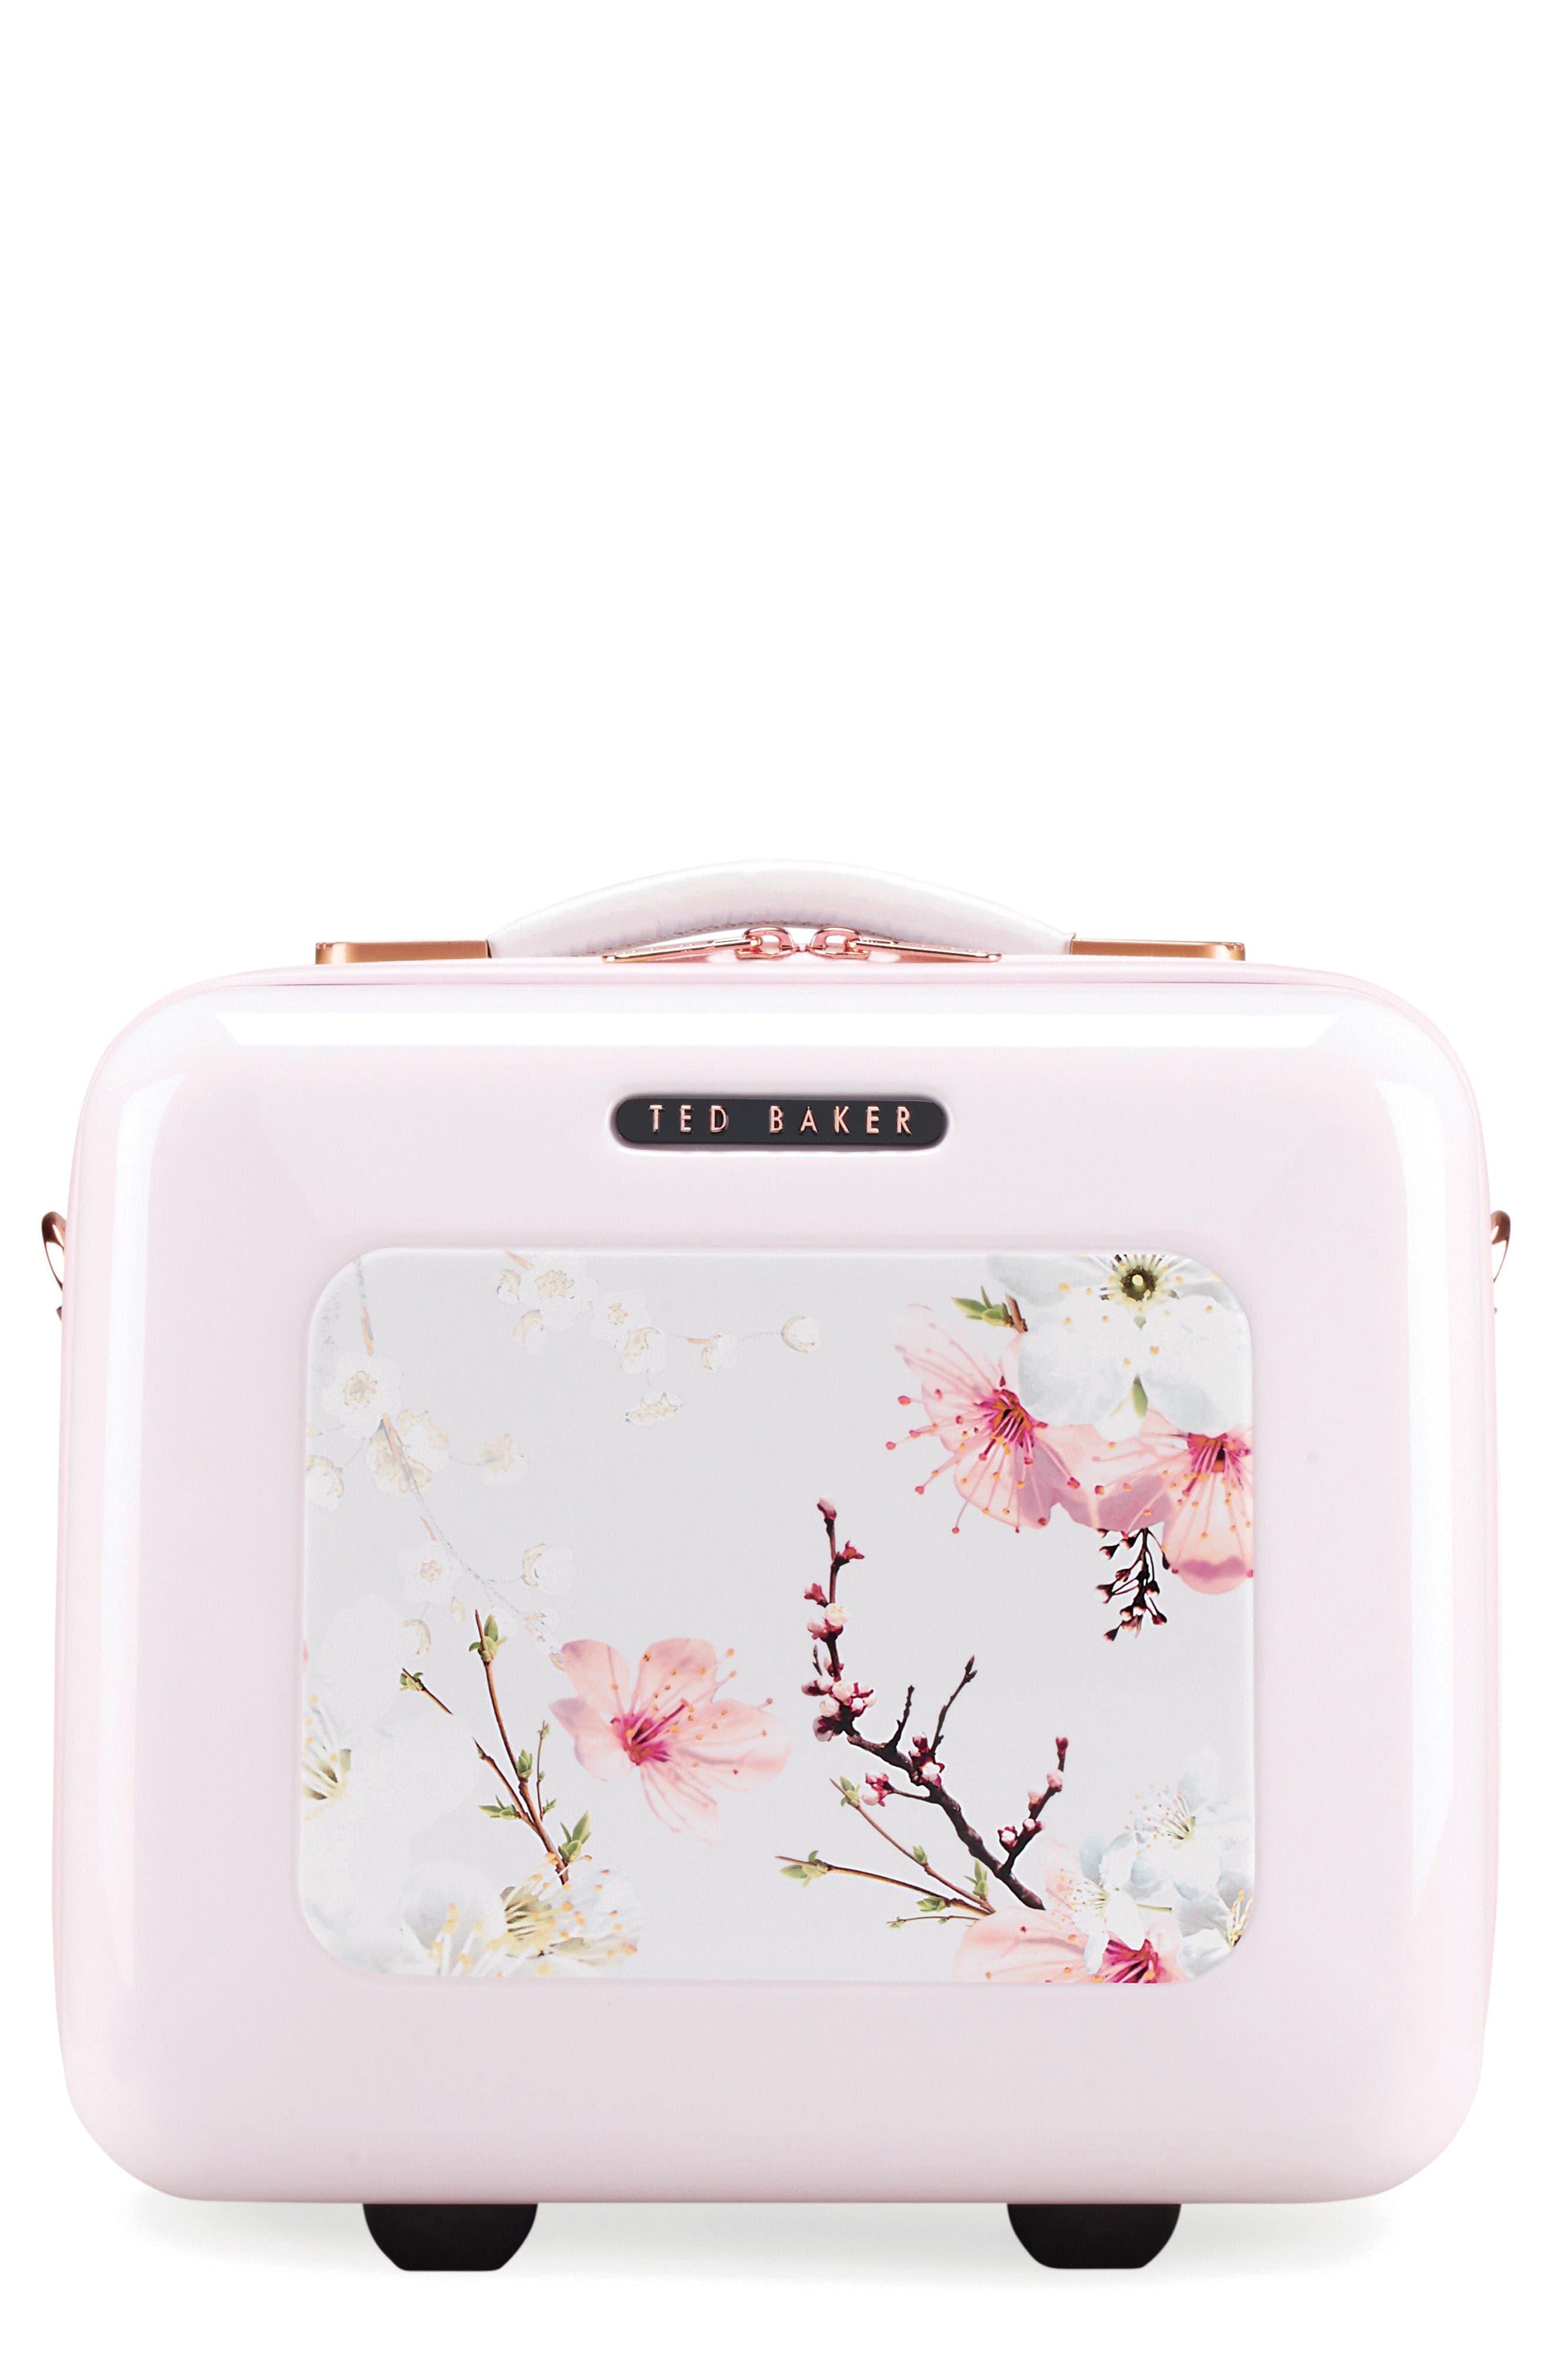 Ted Baker London Blossoms Vanity Case